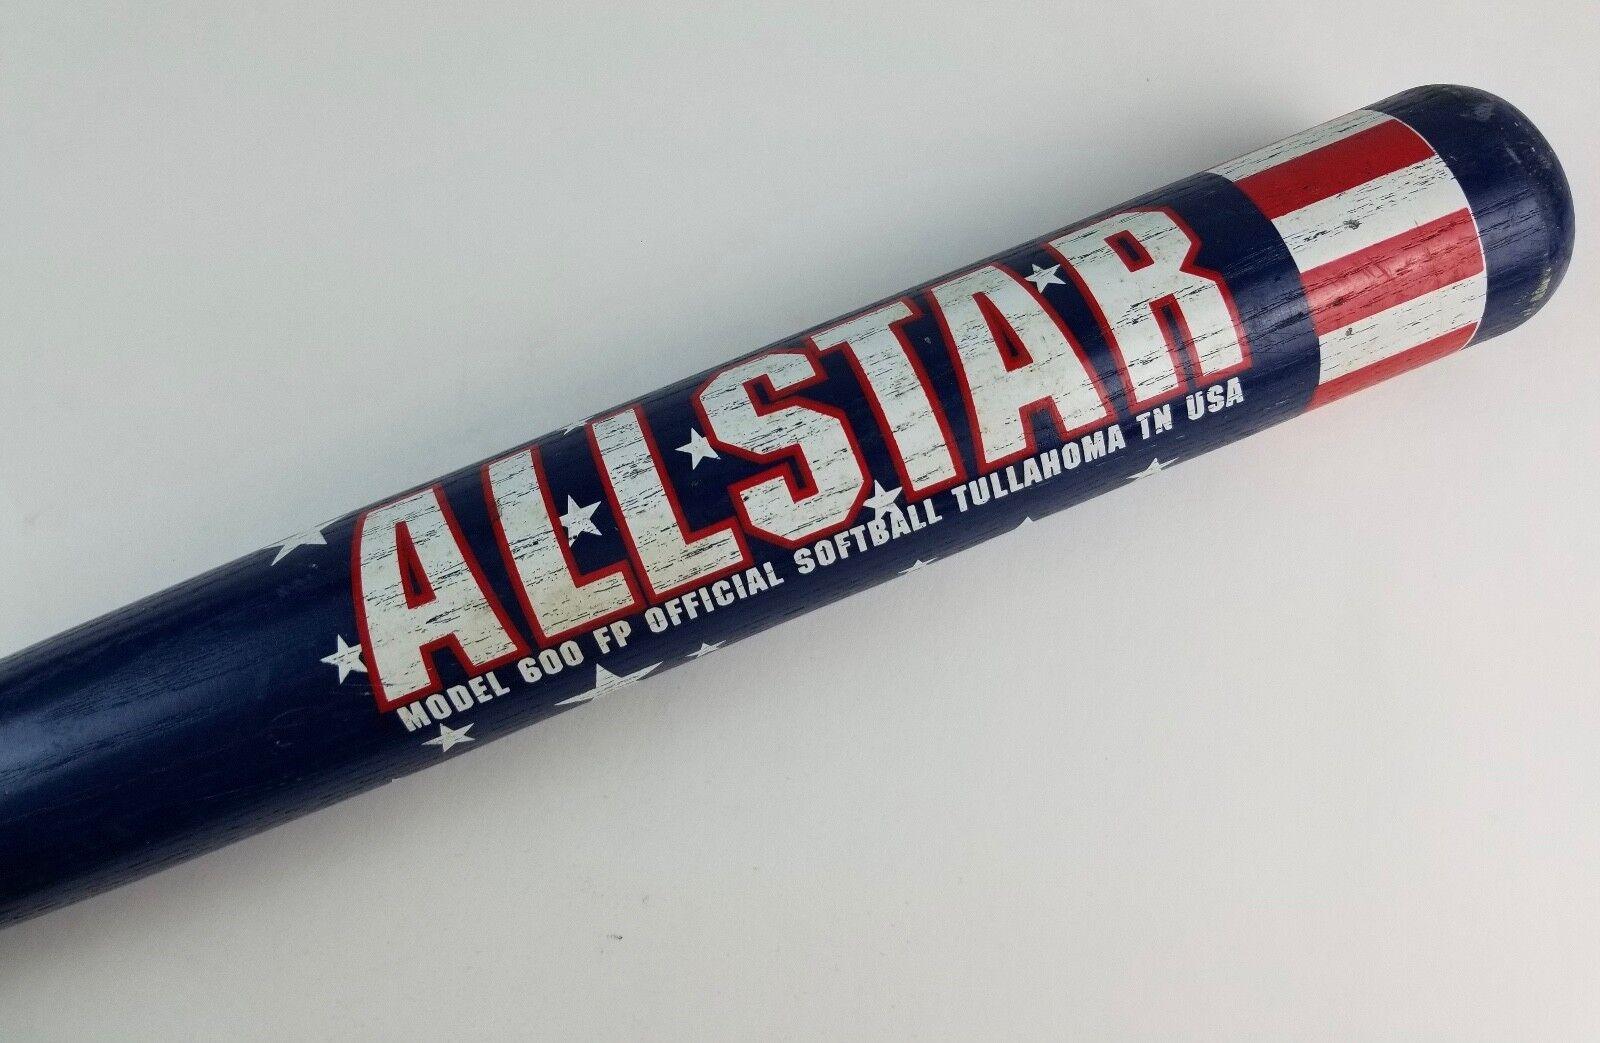 Pre-Owned Softball Bat Worth 600 FP Allstar Red White bluee Star Wooden 34.5